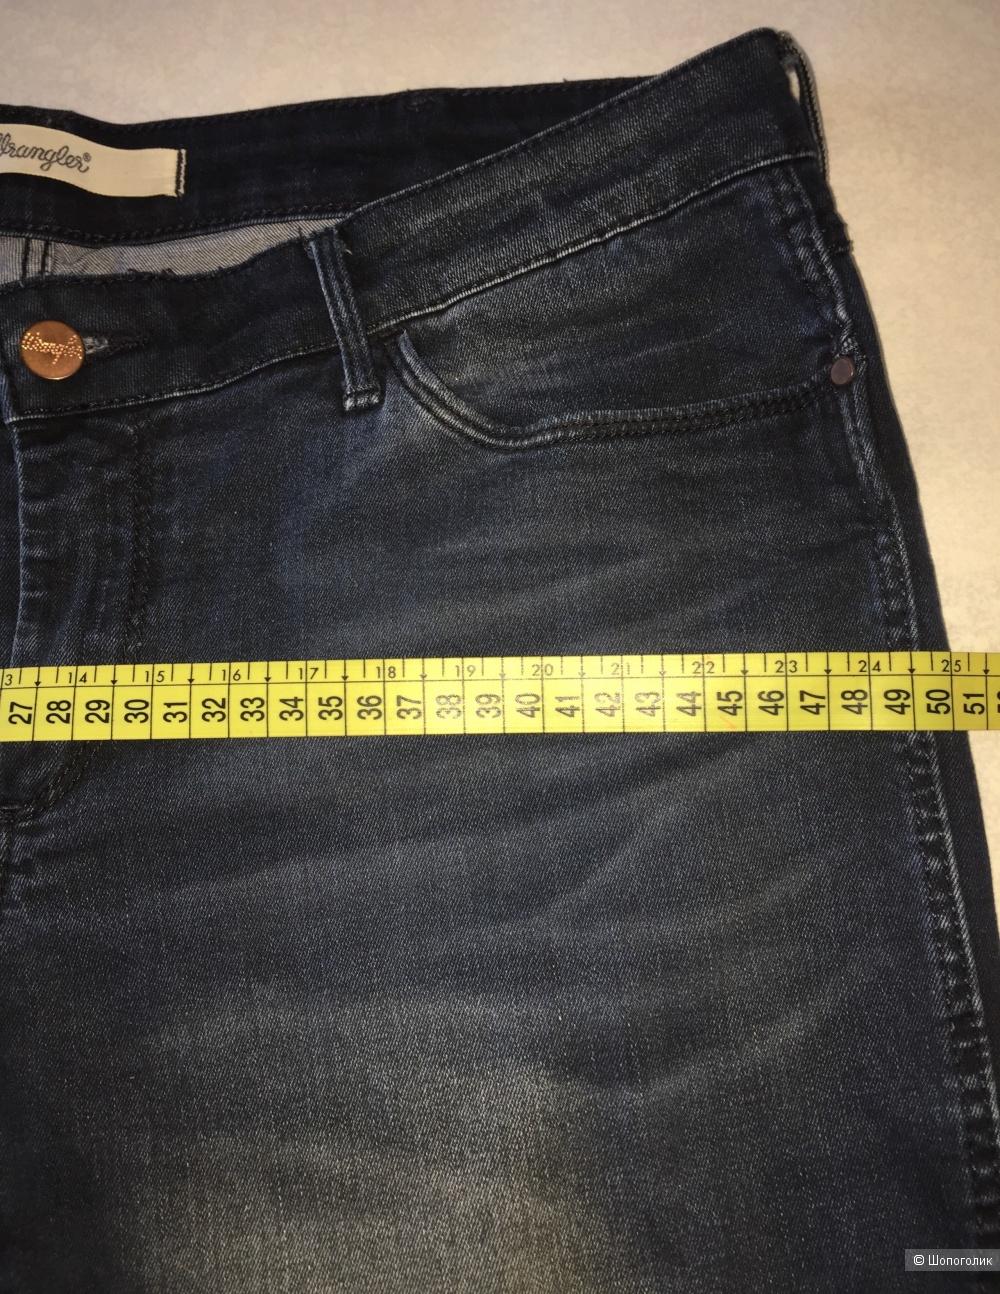 Джинсы Wrangler размер 32/34 наш 52